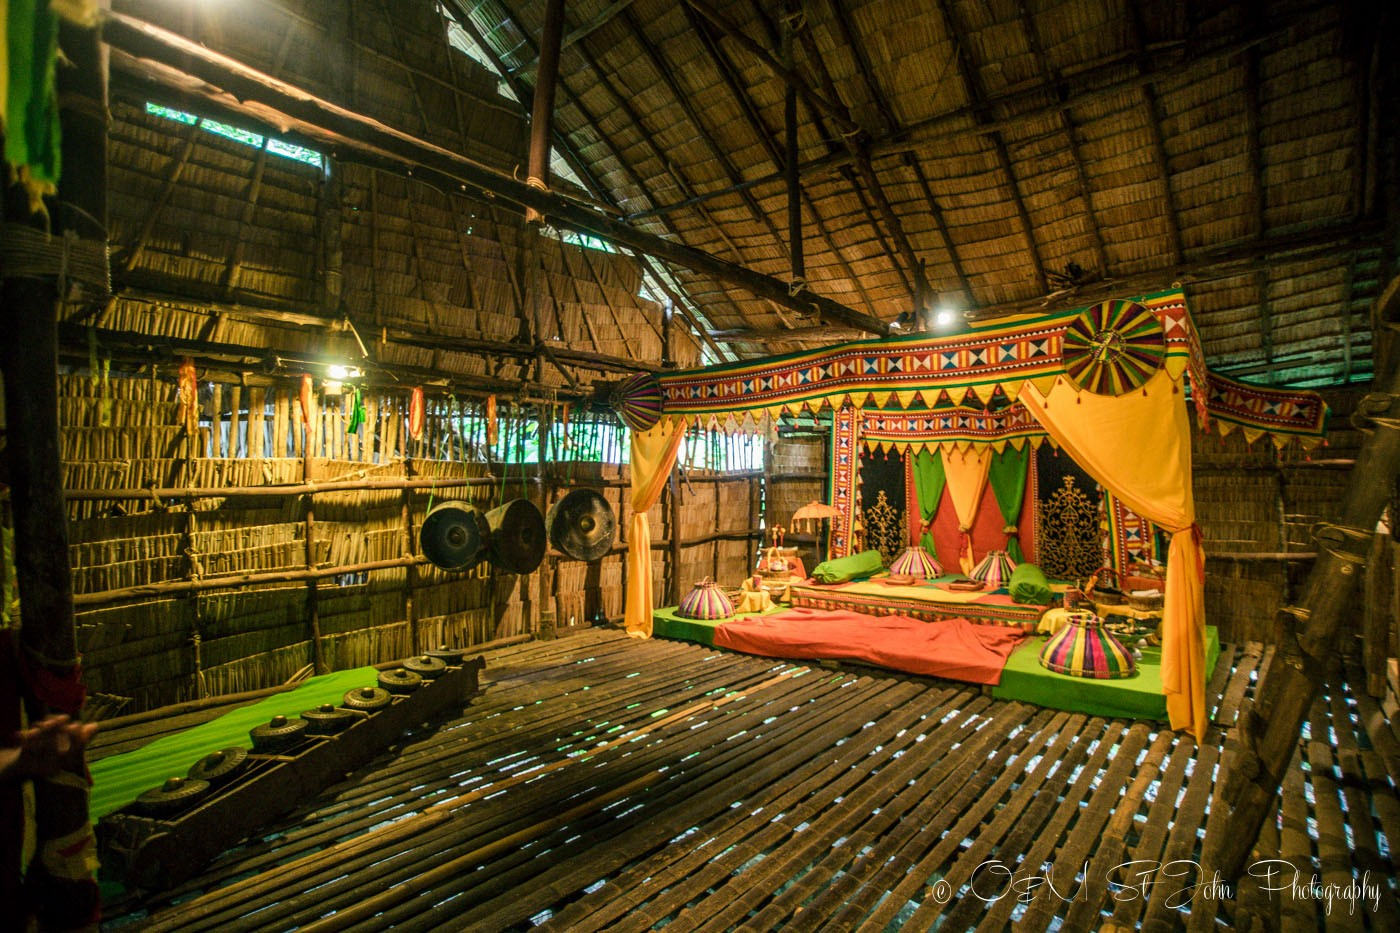 Traditional wedding set up inside one of the huts at the Mari Mari Cultural Village. Sabah. Malaysia